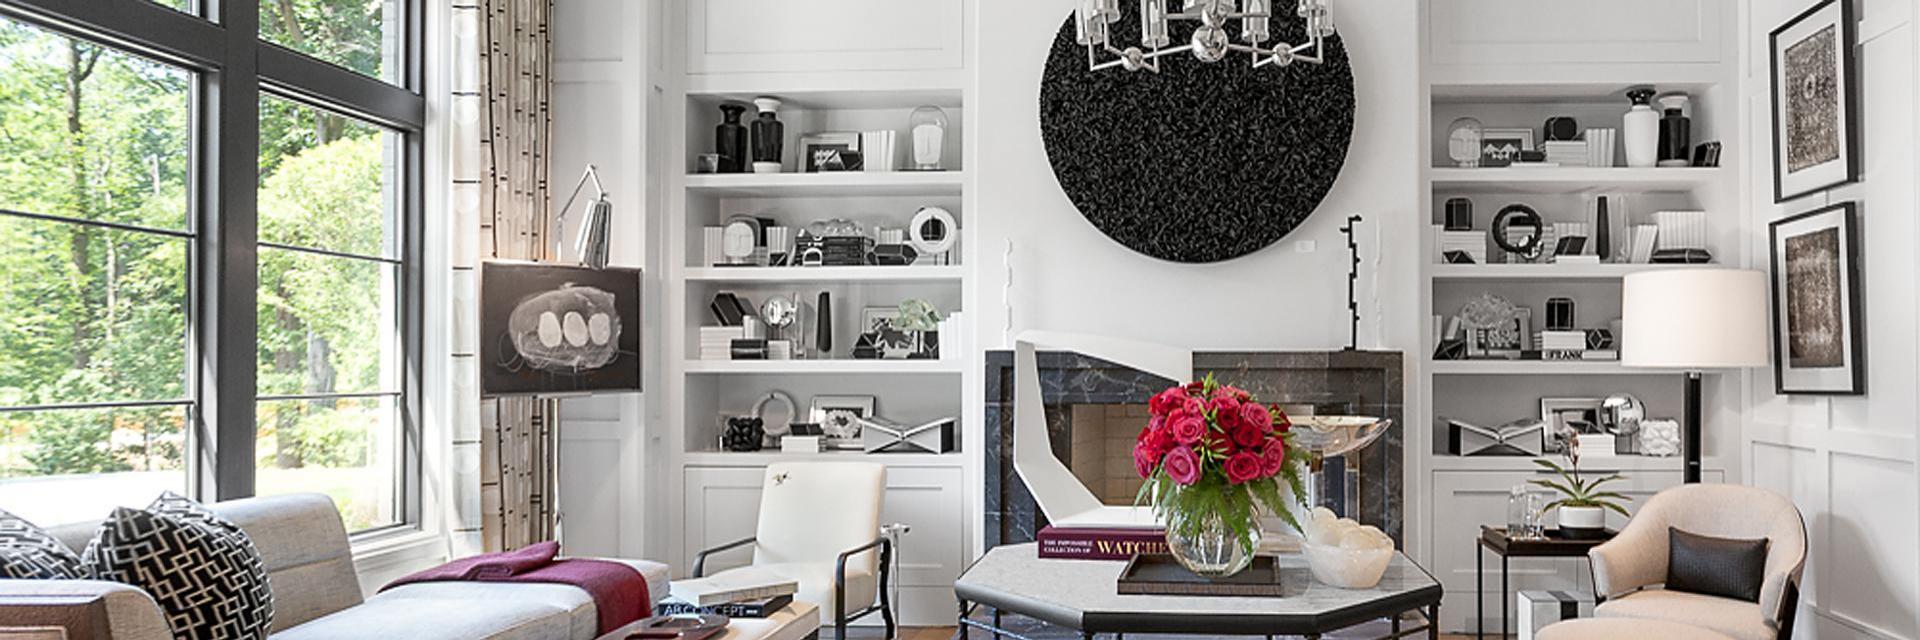 cept masters in interior design styles